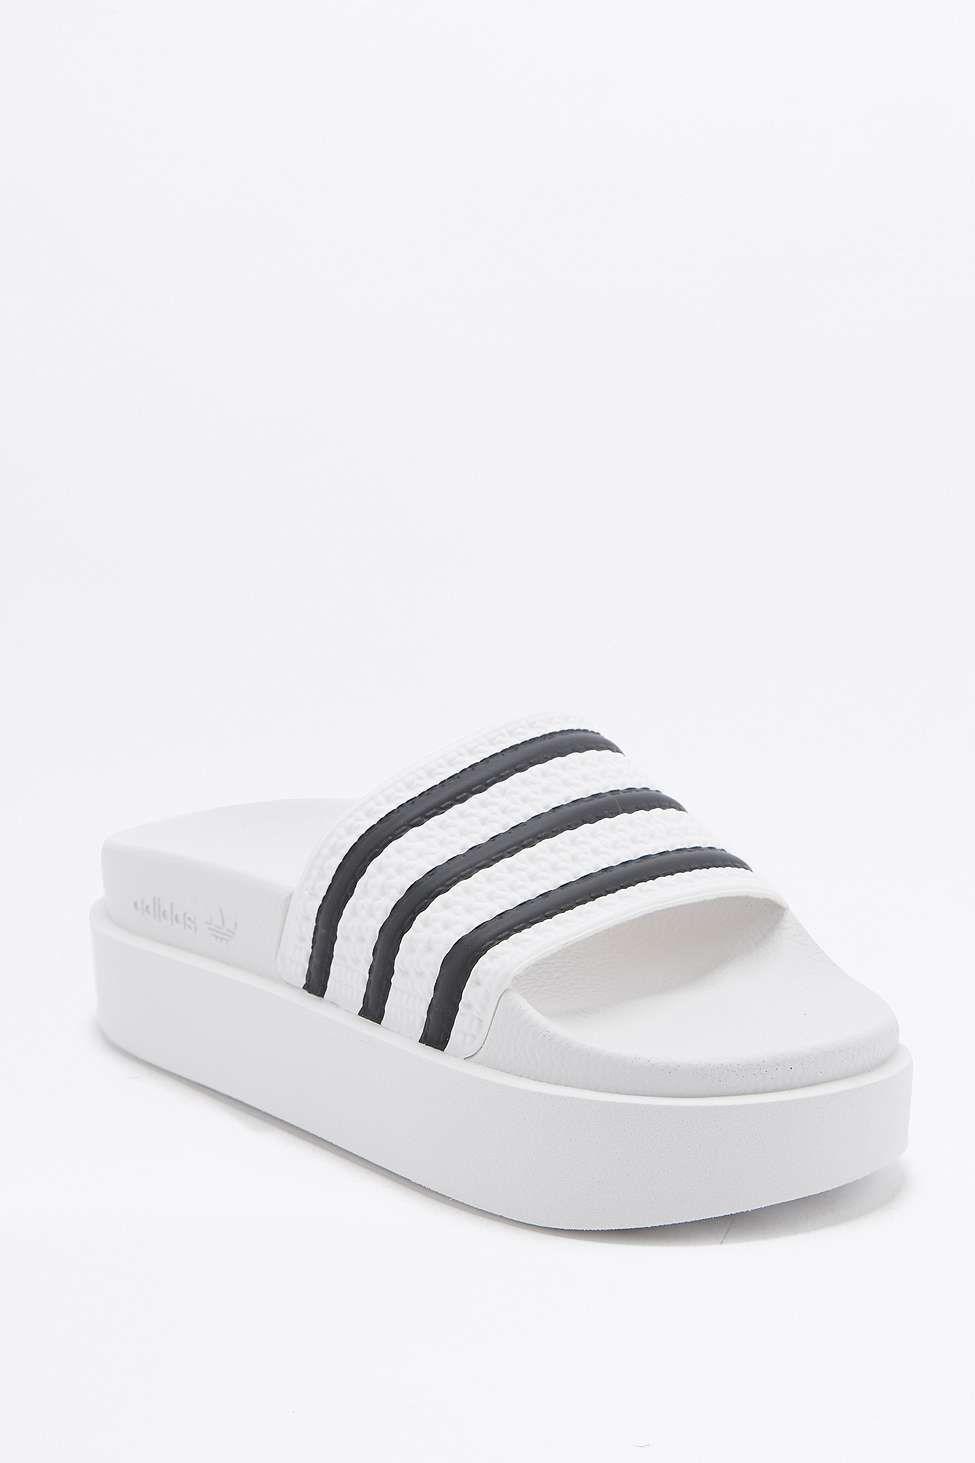 58dc89b46a4 Adidas Originals Adilette платформы Белый бассейн слайдера - Urban  Outfitters